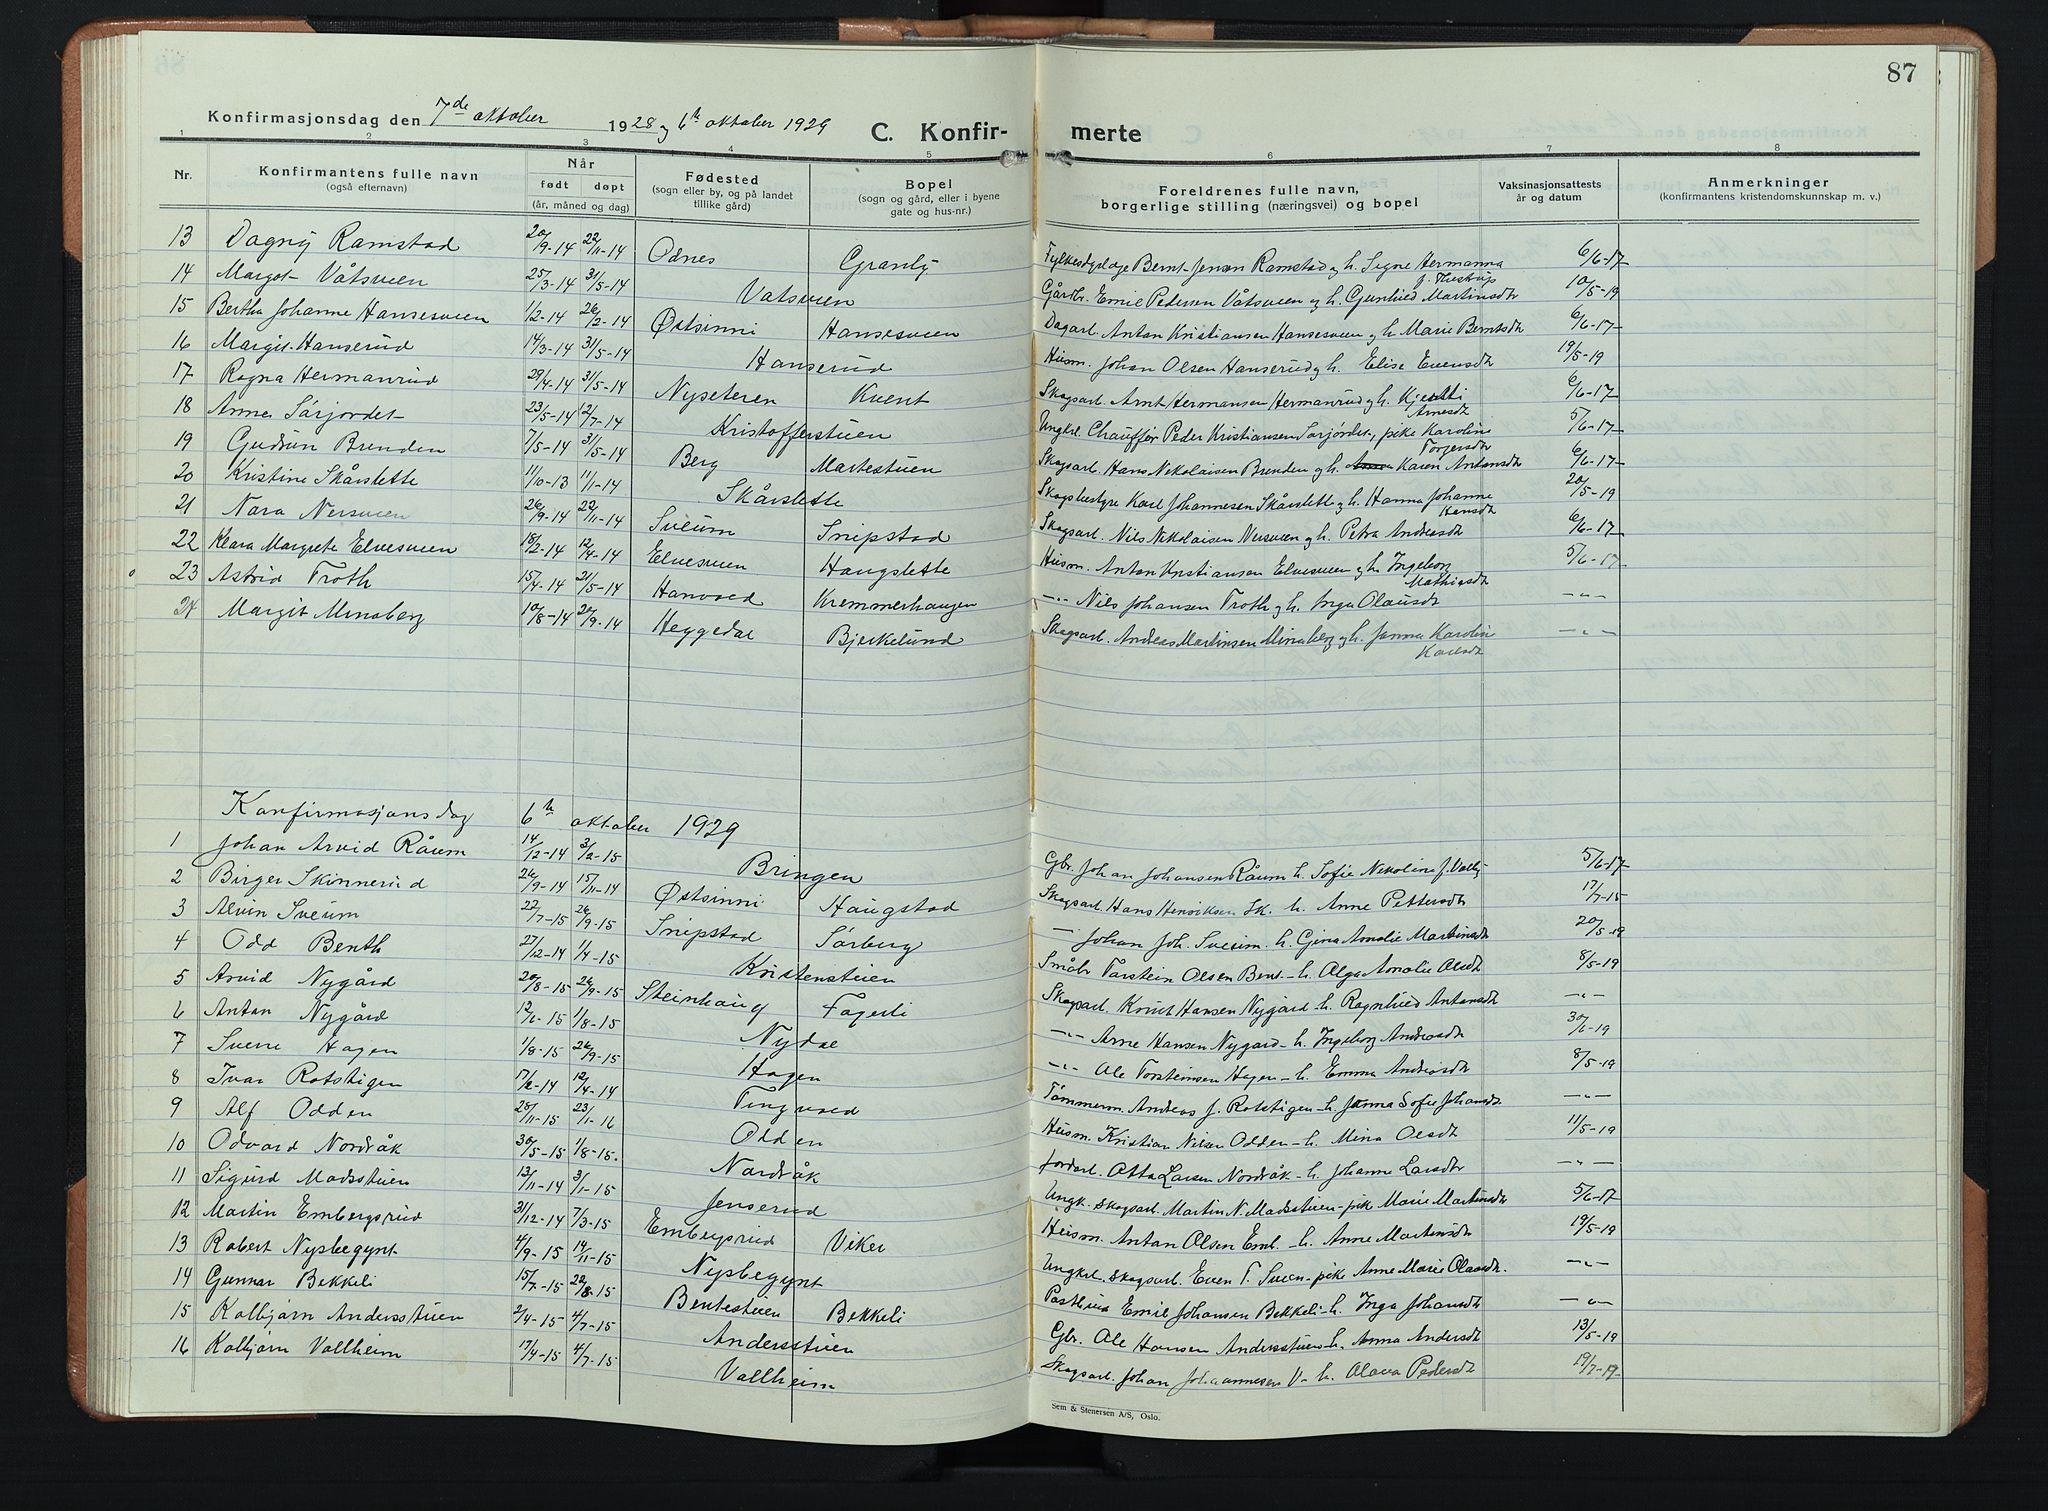 SAH, Søndre Land prestekontor, L/L0008: Klokkerbok nr. 8, 1926-1950, s. 87